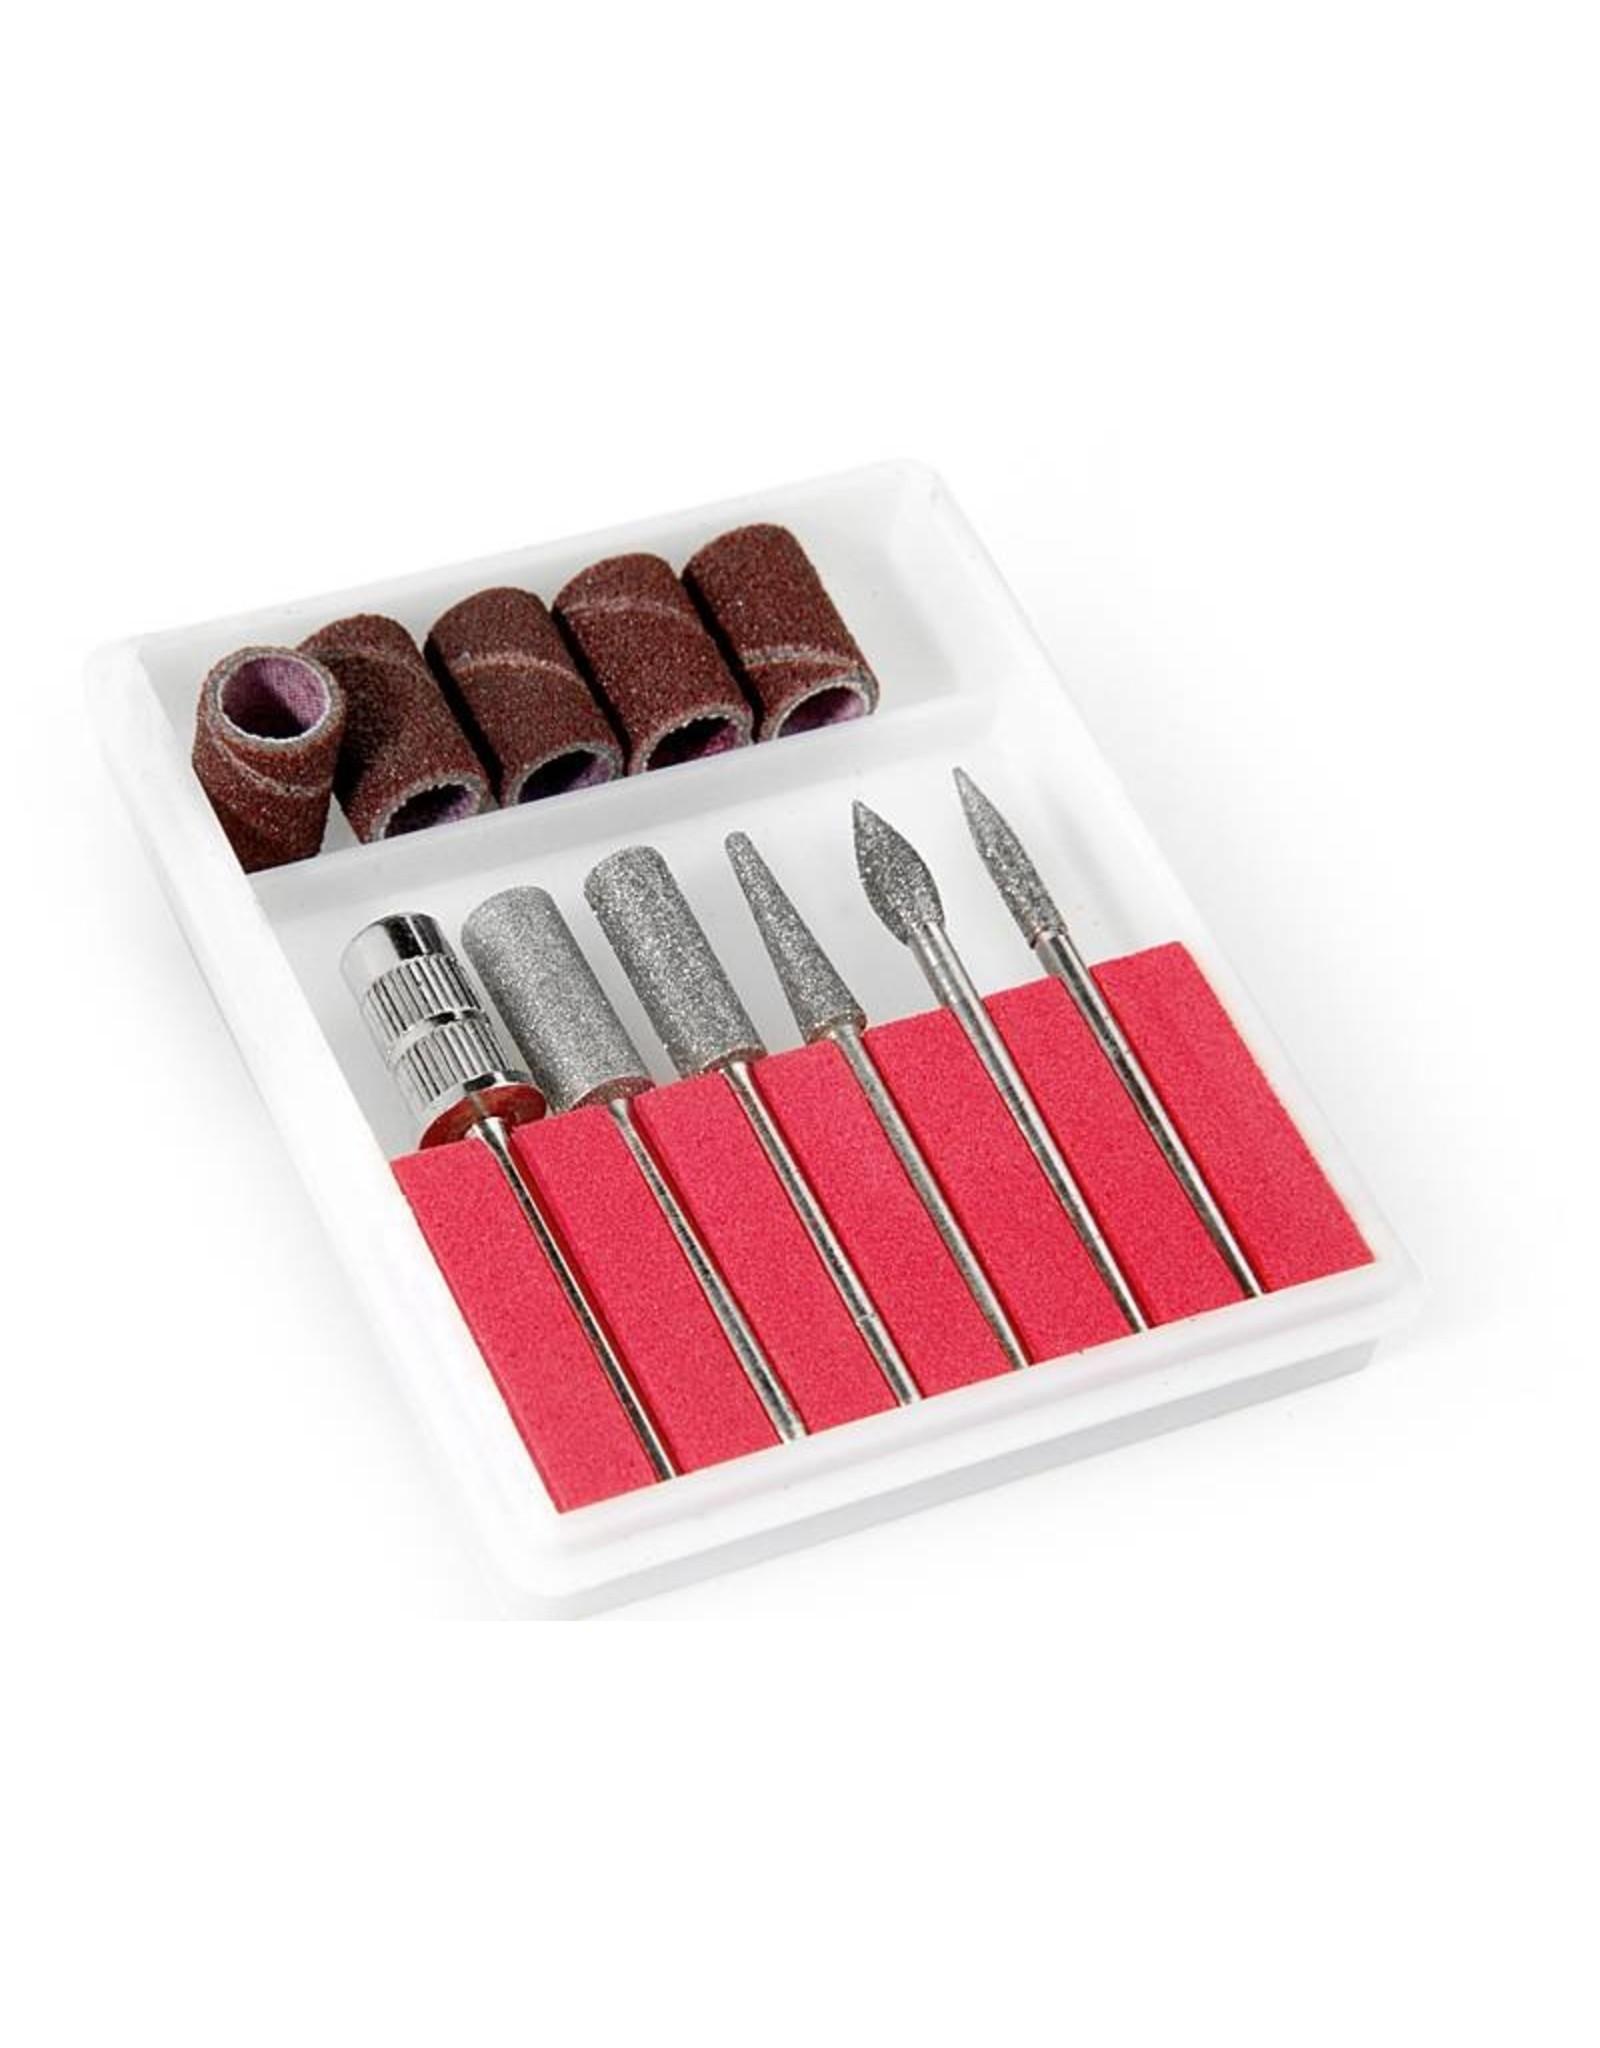 Mega Beauty Shop® Nagelfrees  JD500 35Watt Wit + 3 trapeze vijlen, bitsetje en 30 schuurrolletjes  MBS®